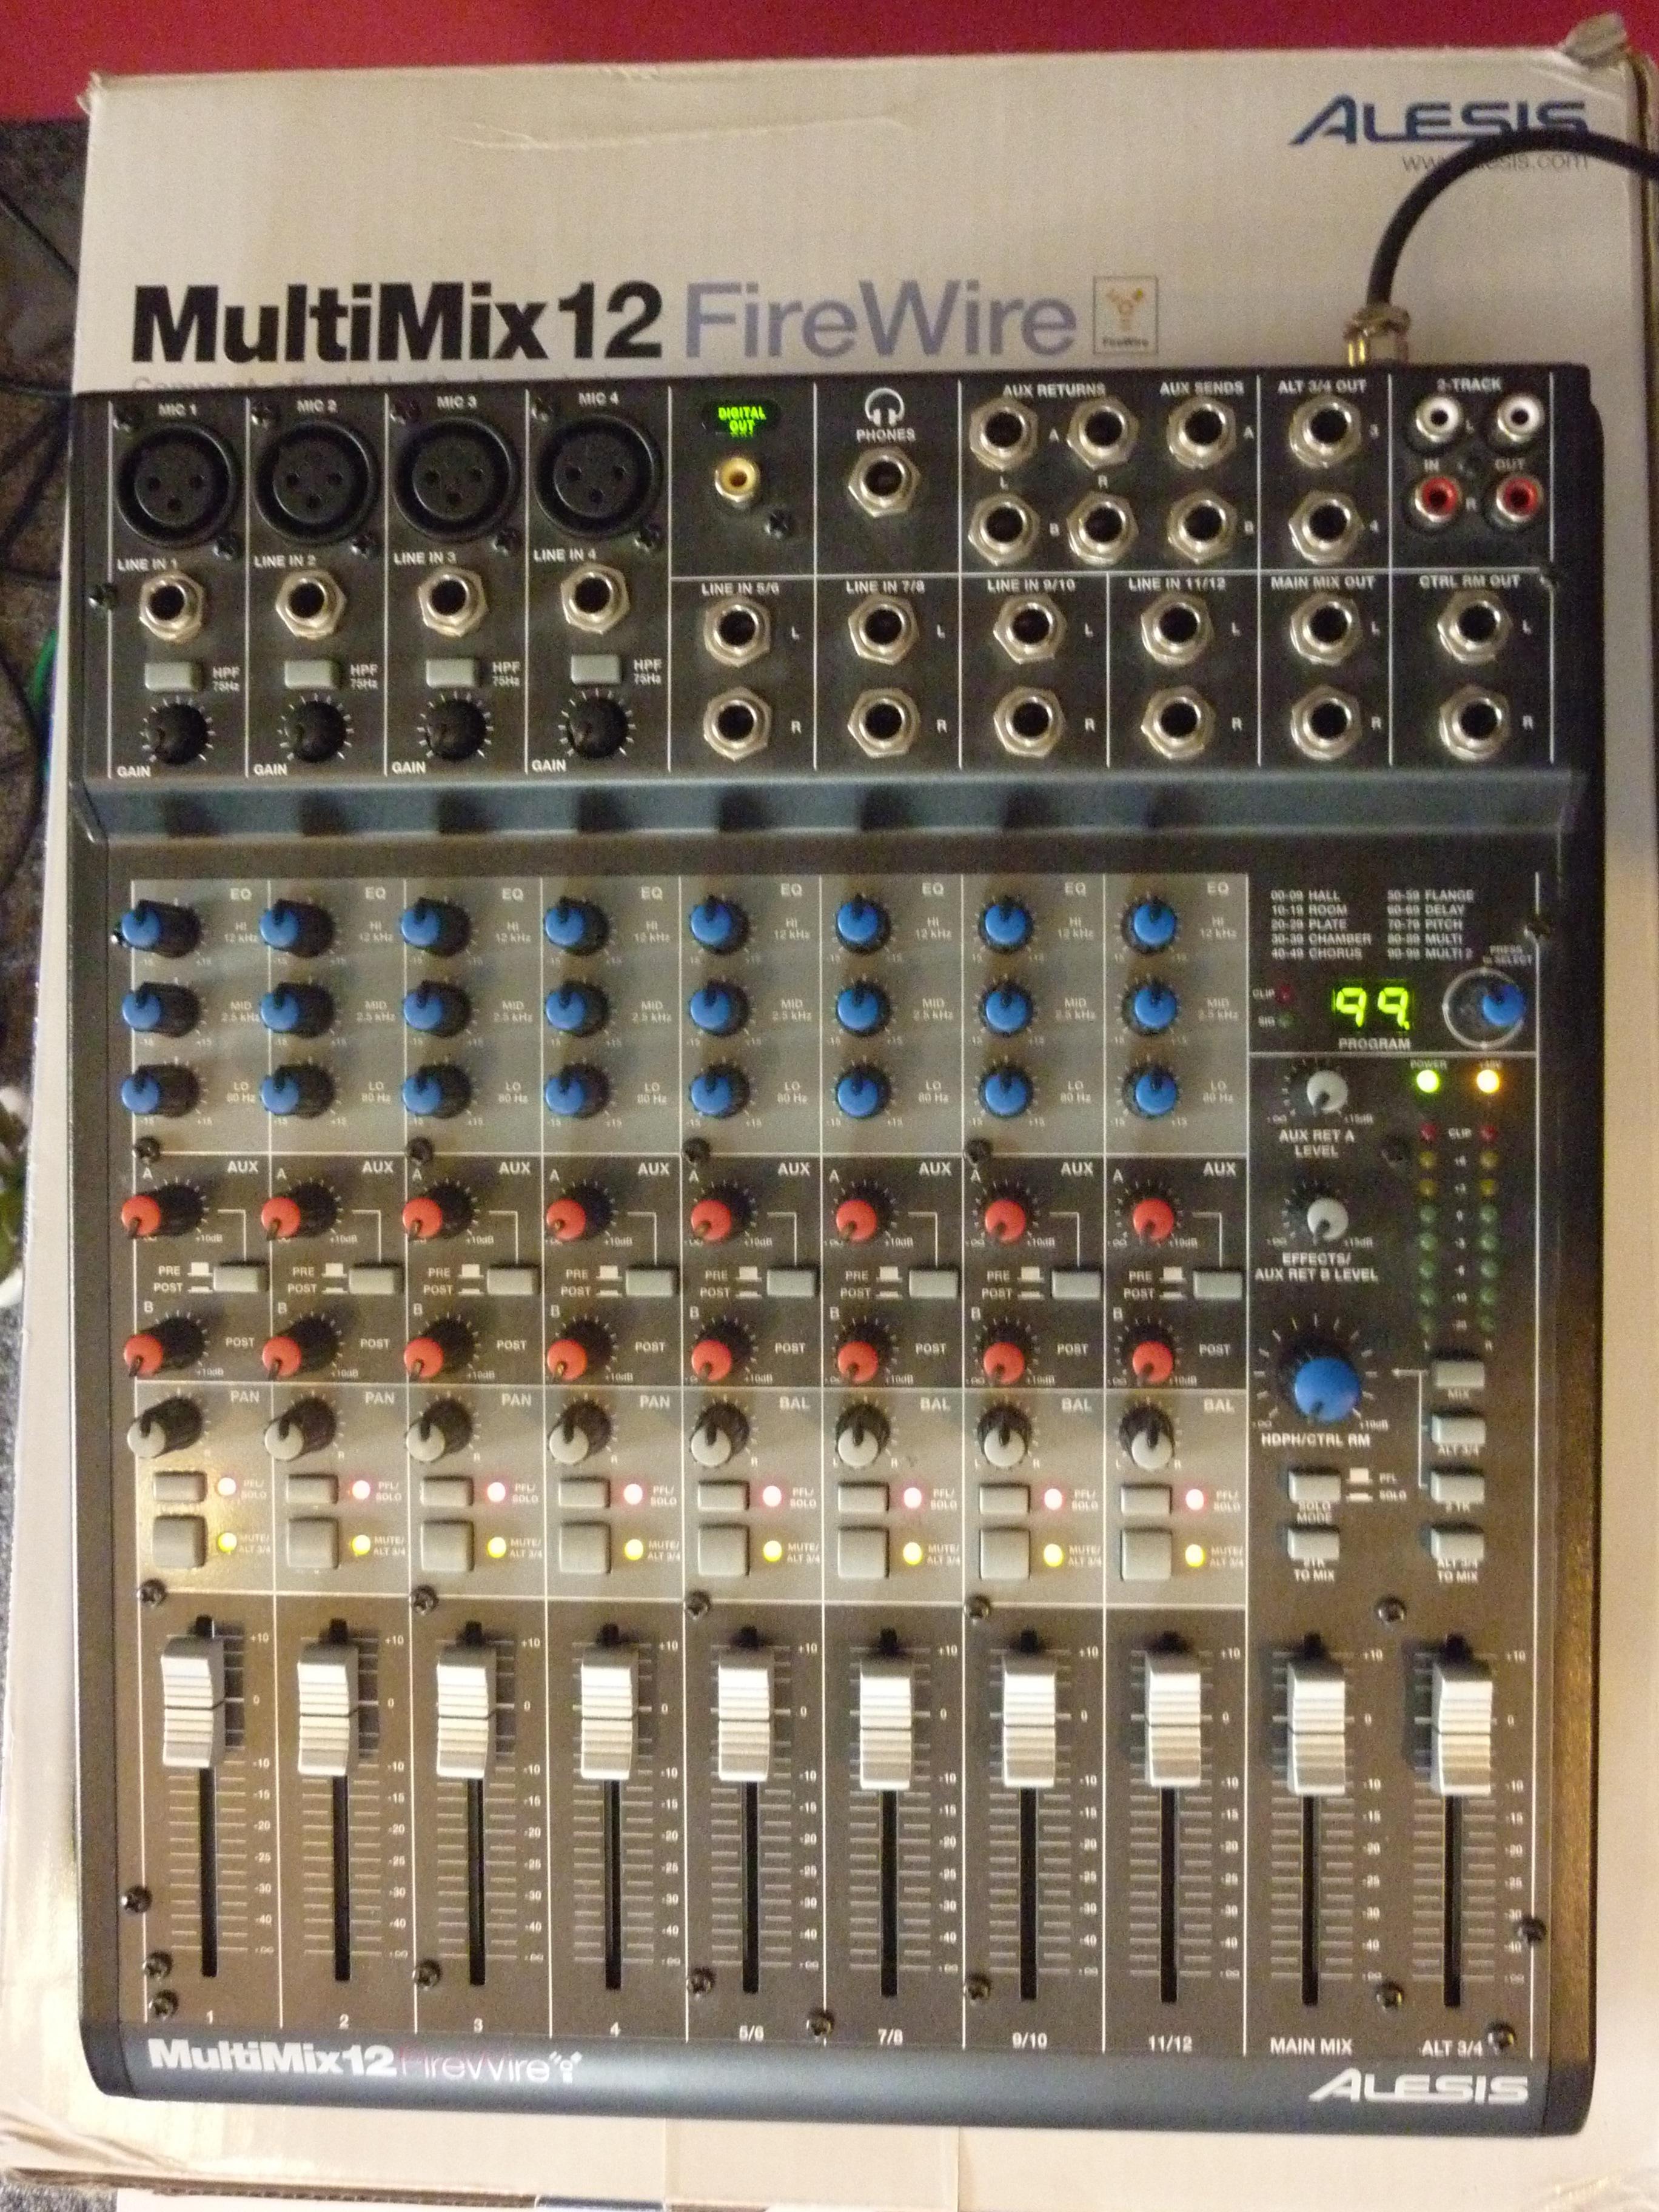 alesis multimix 12 firewire manual pdf